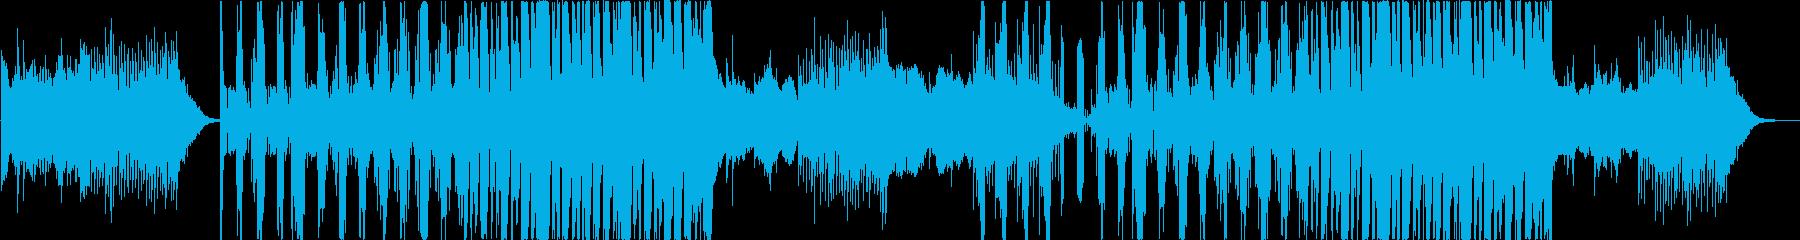 cool、近未来的、不思議さもあるEDMの再生済みの波形